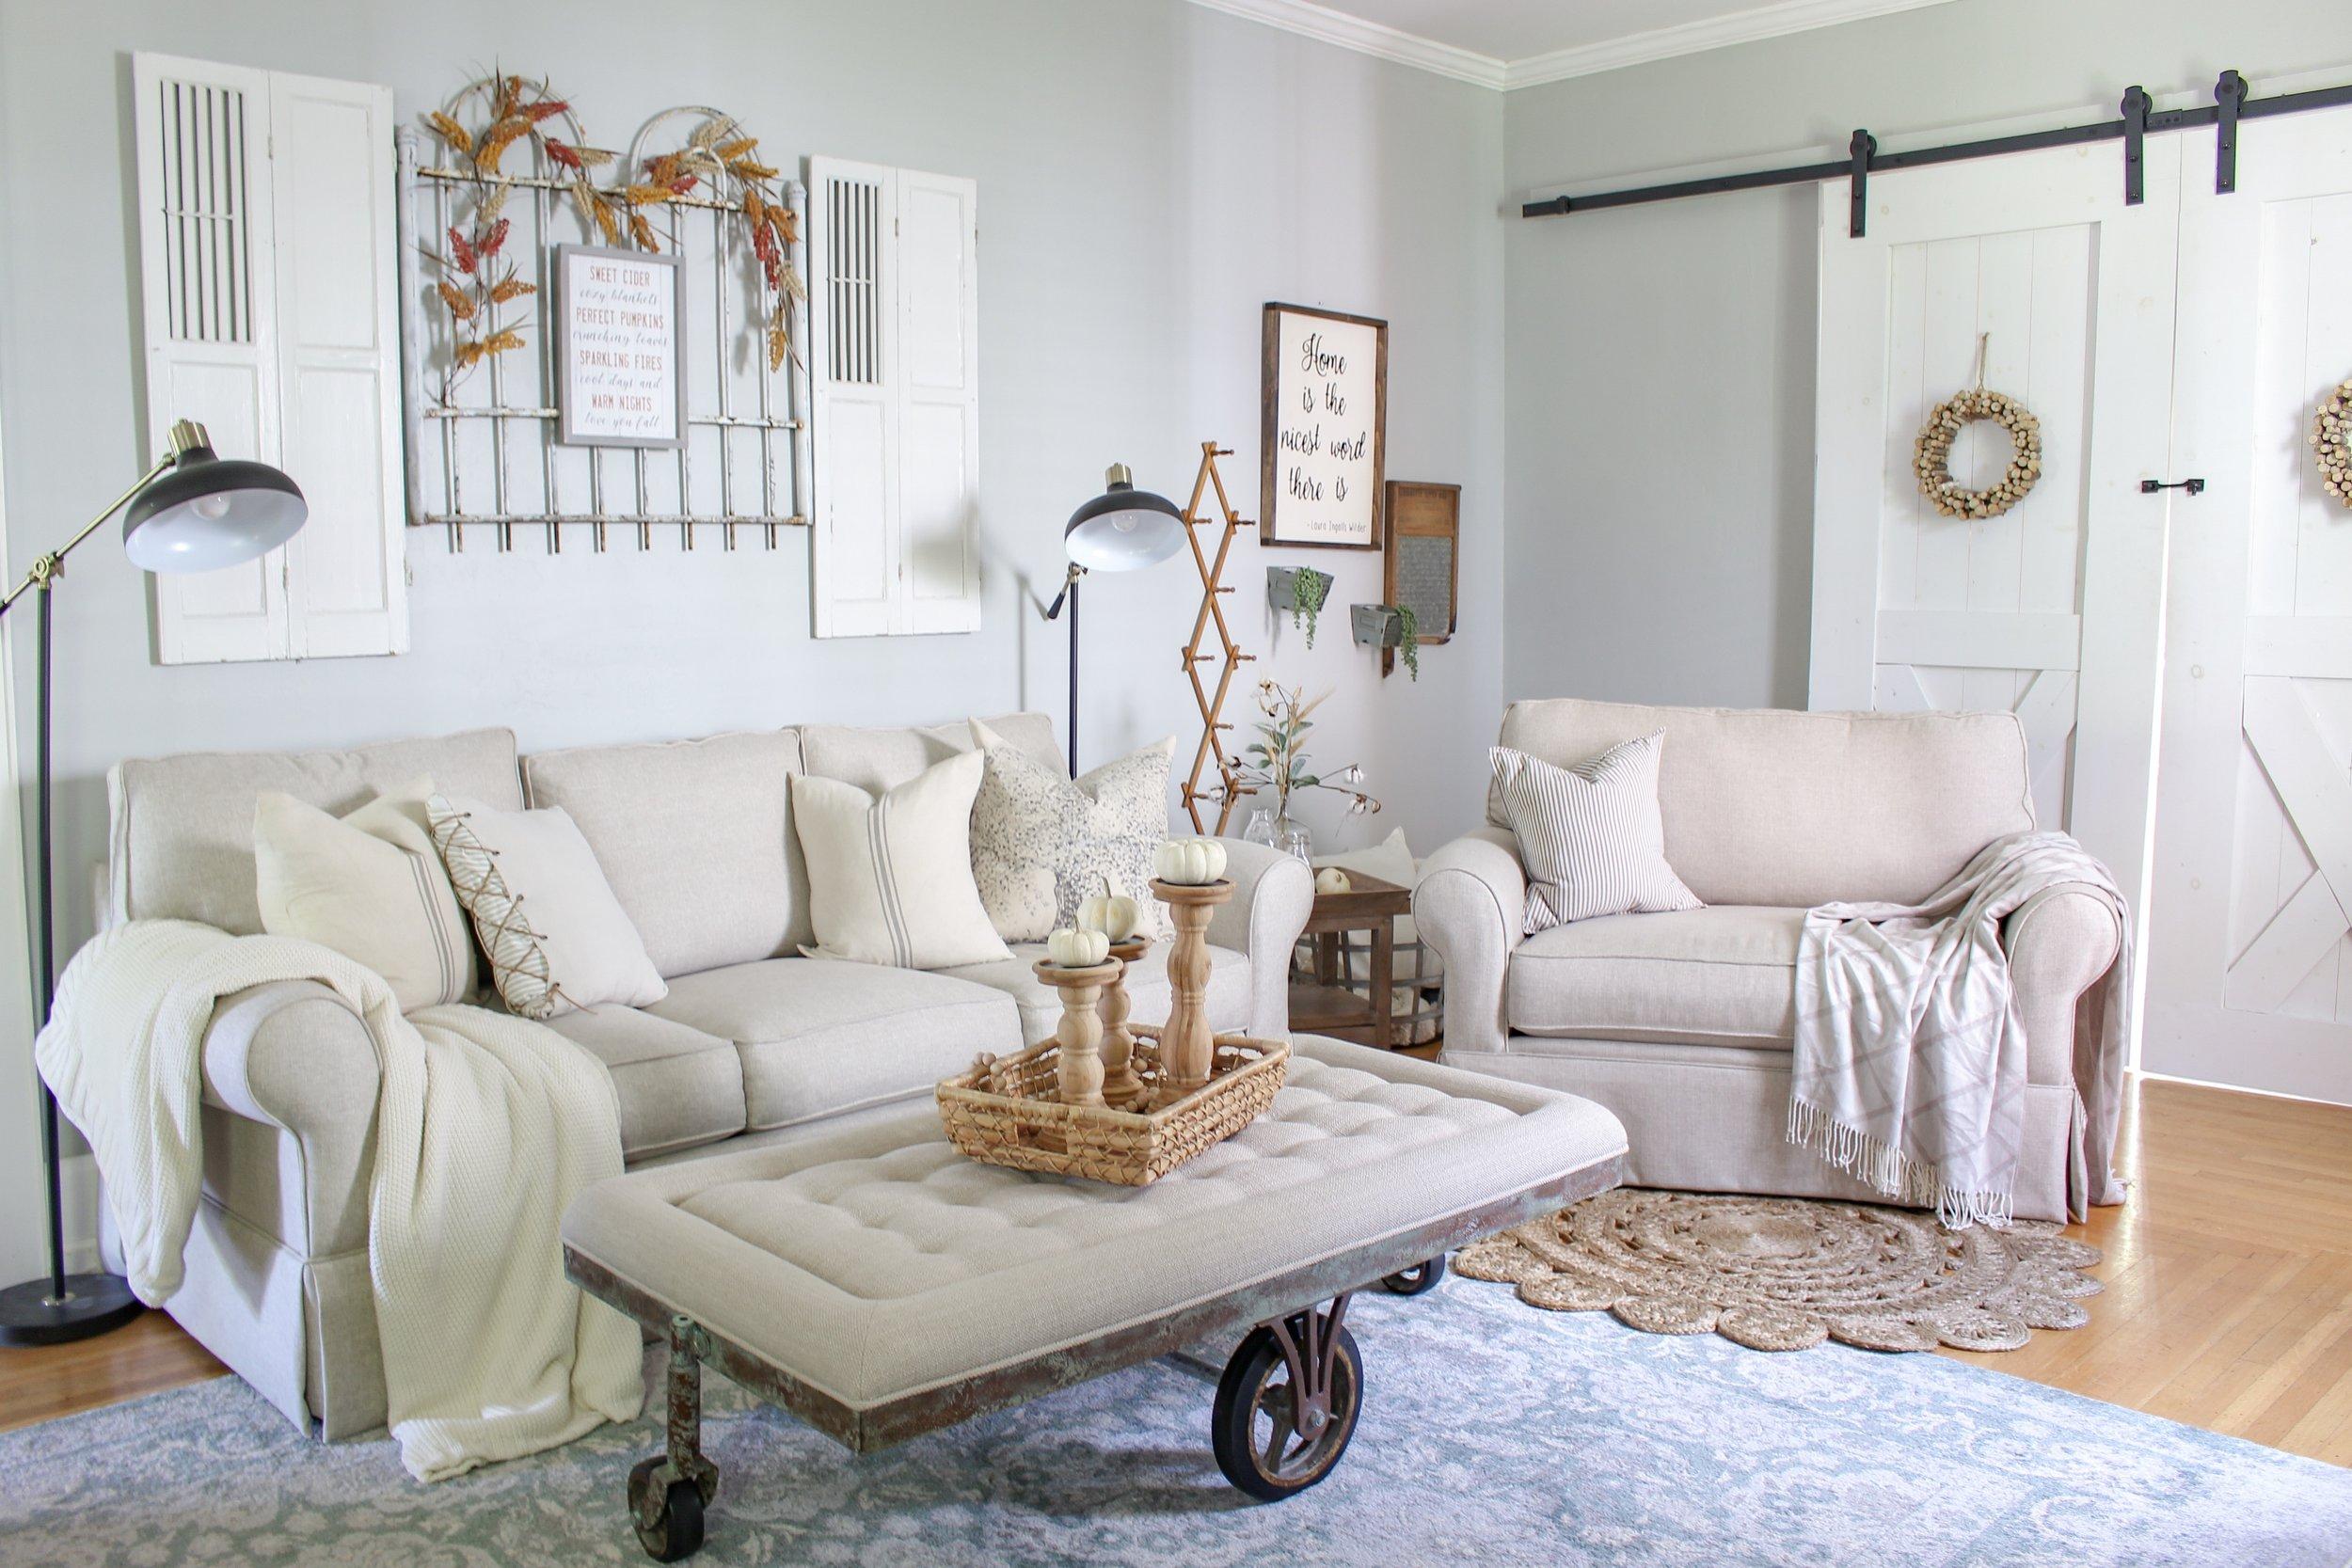 Sofa, chair, and coffee table